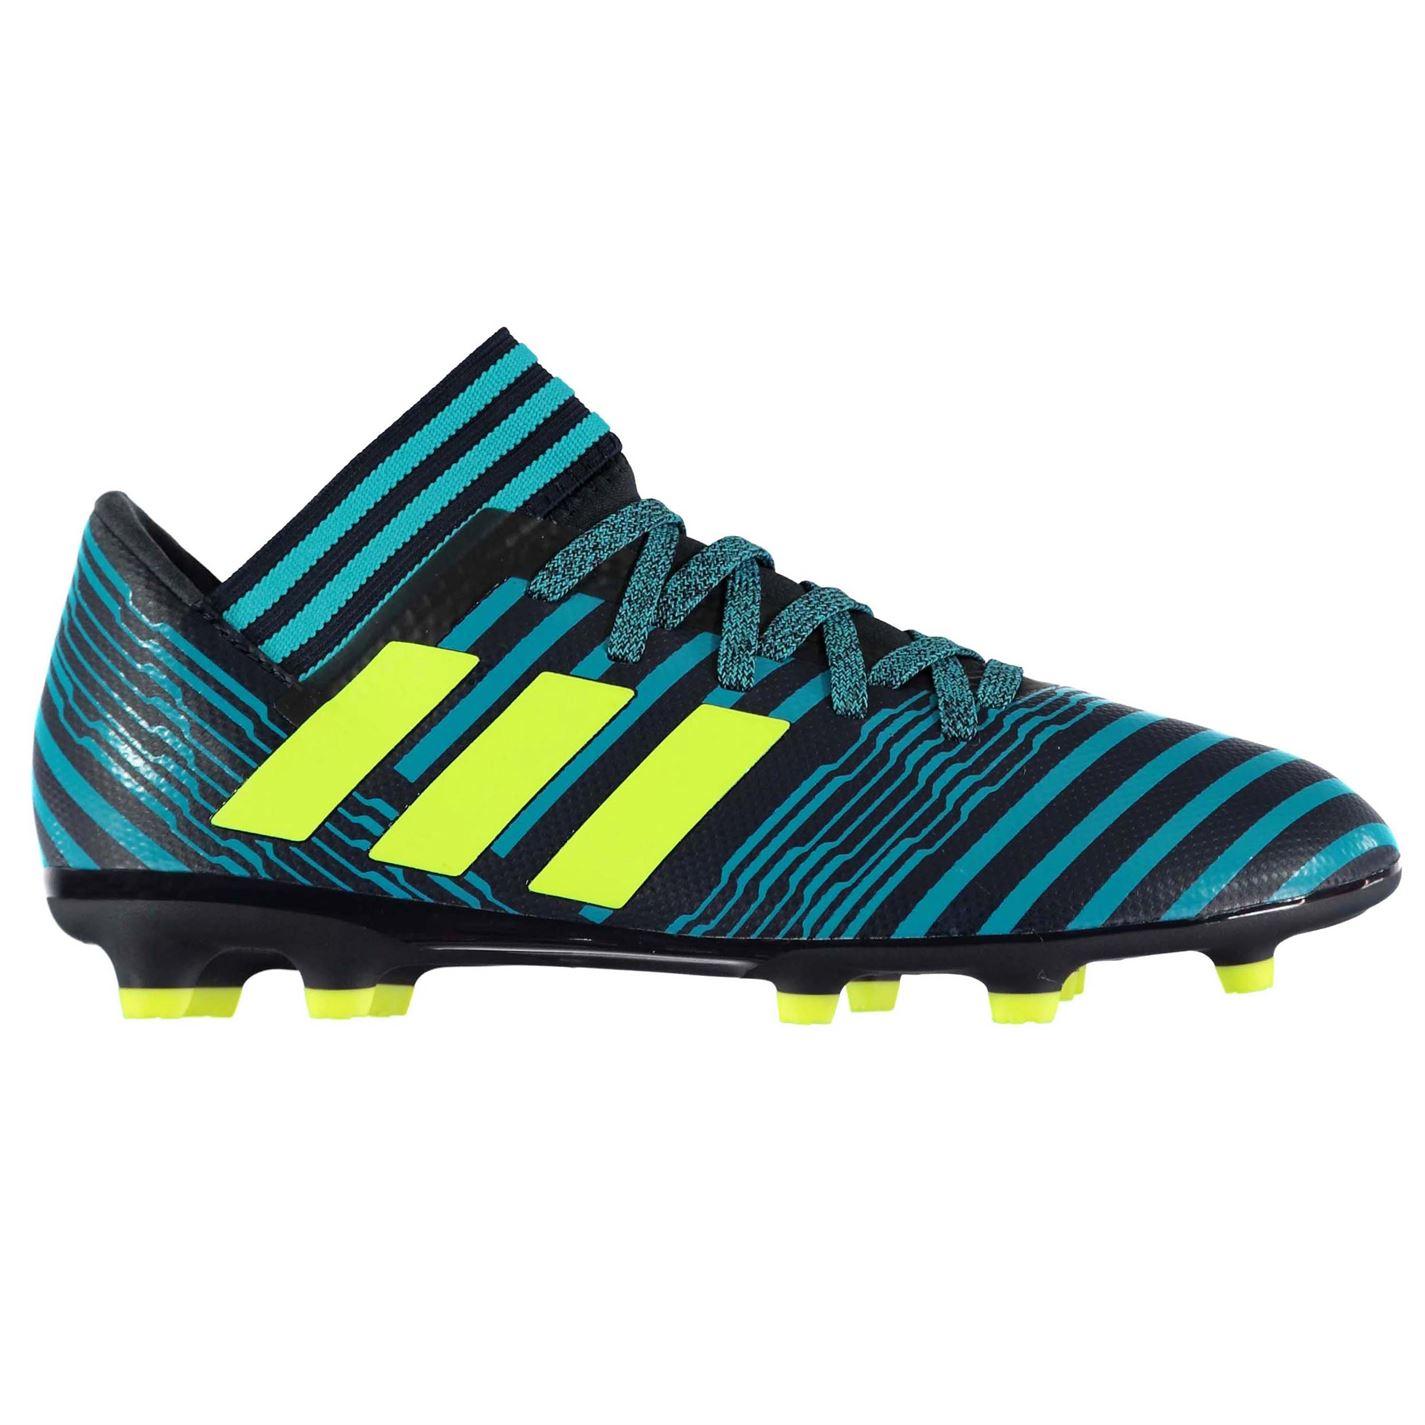 2511ed92fbe51 Adidas Nemeziz 17.3 FG Junior Football Boots - Glami.sk